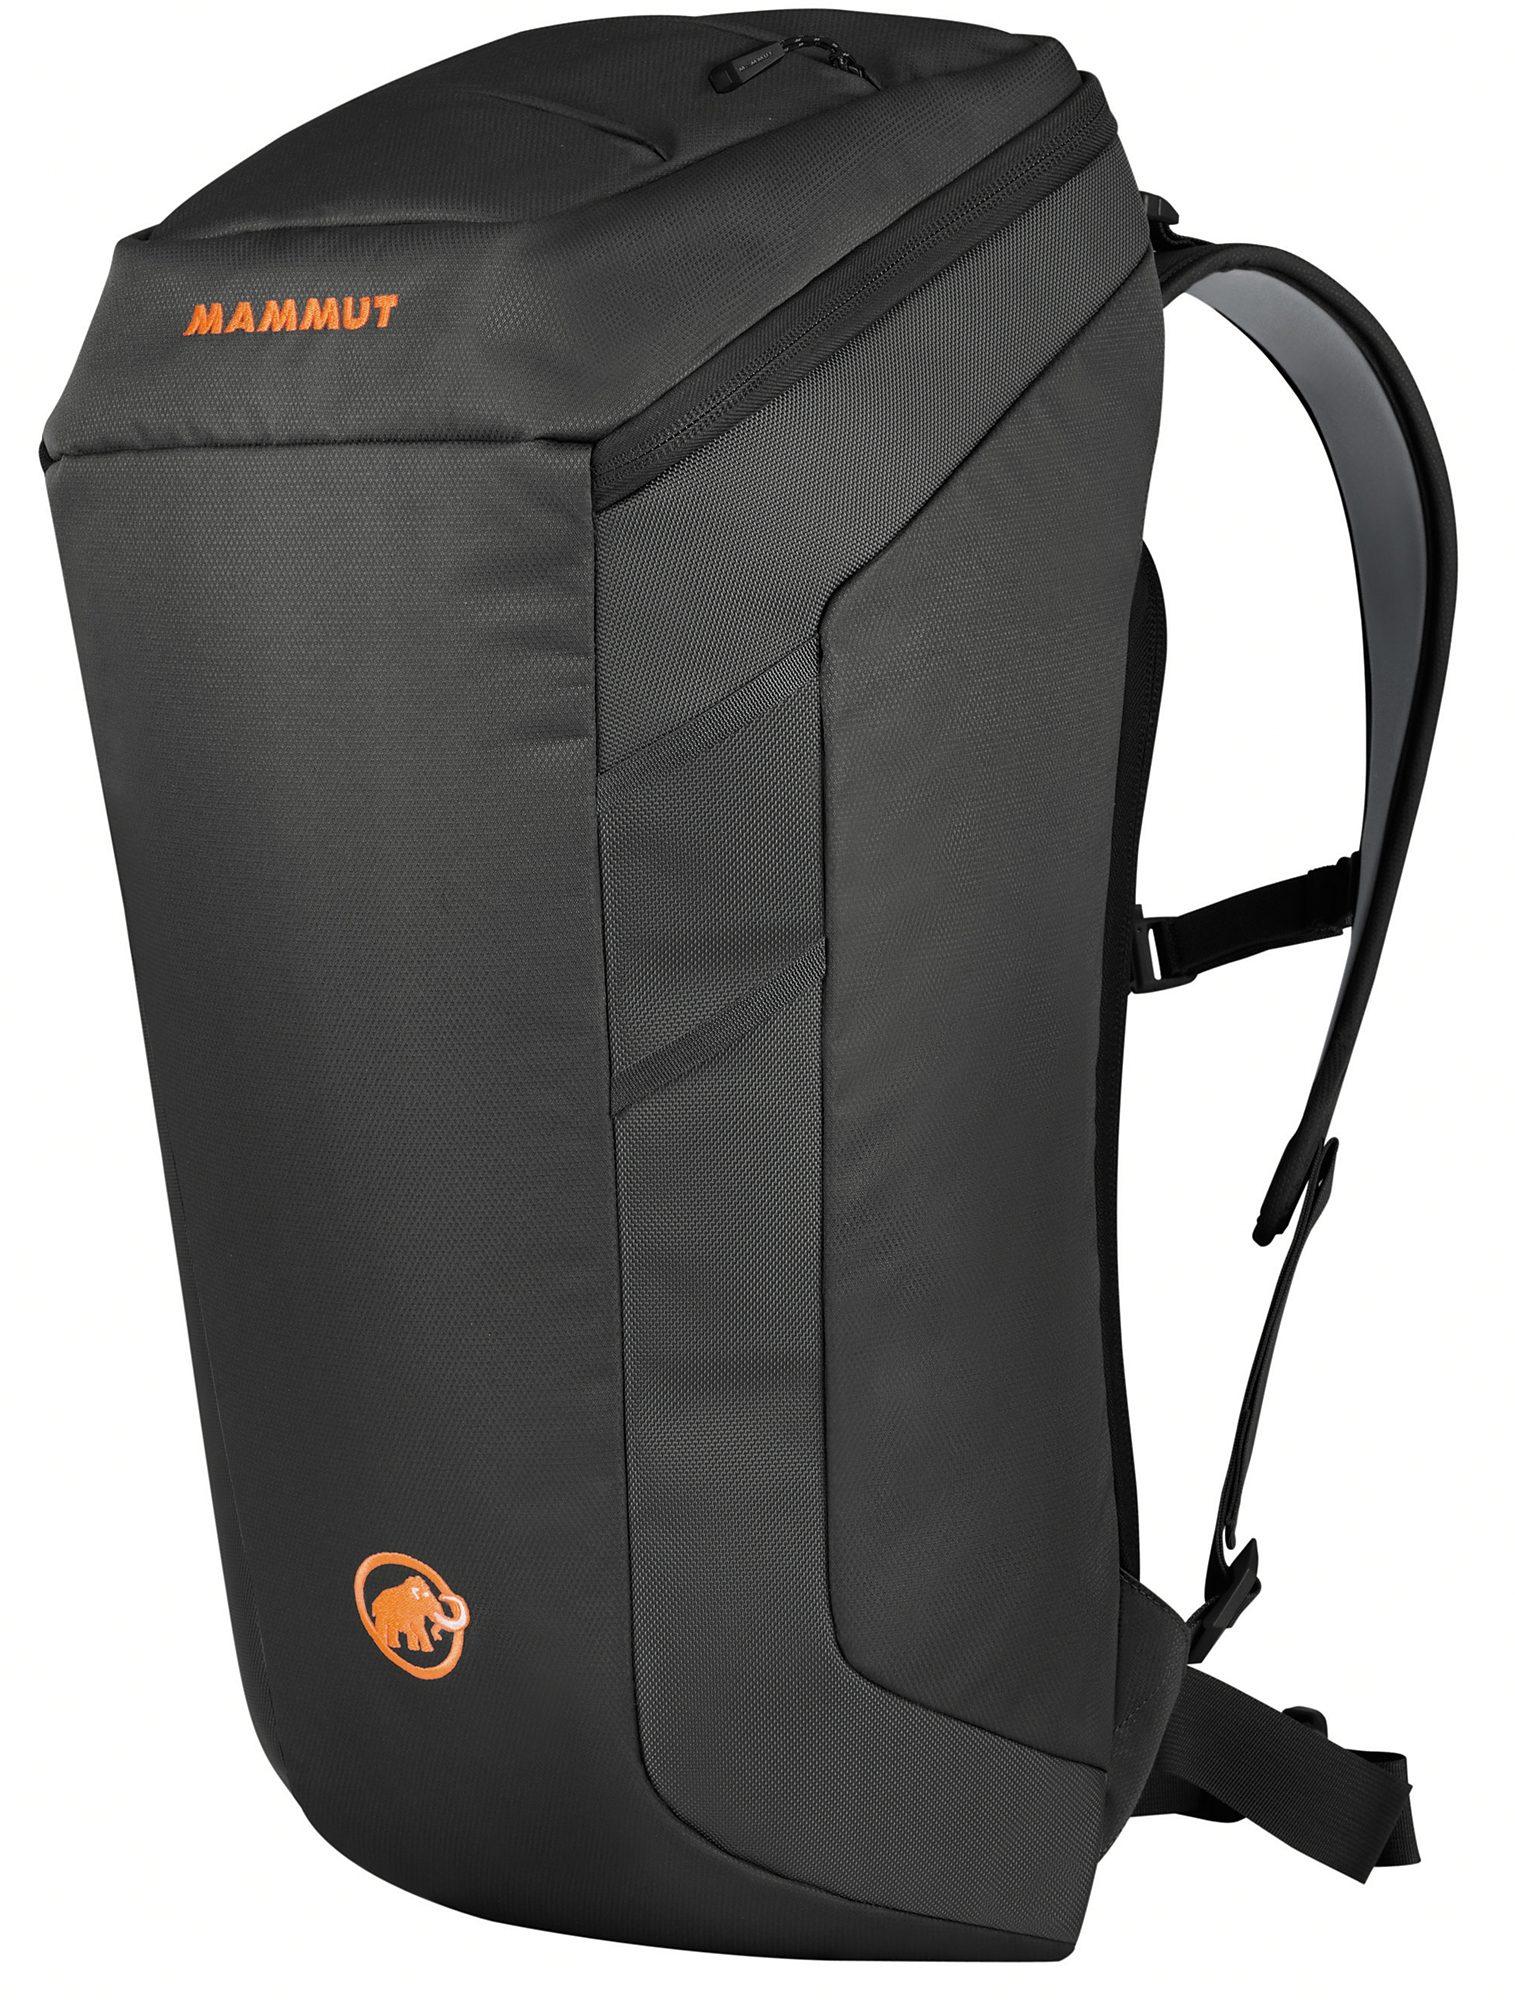 Mammut Kletterrucksack »Neon Gear 45 Backpack«